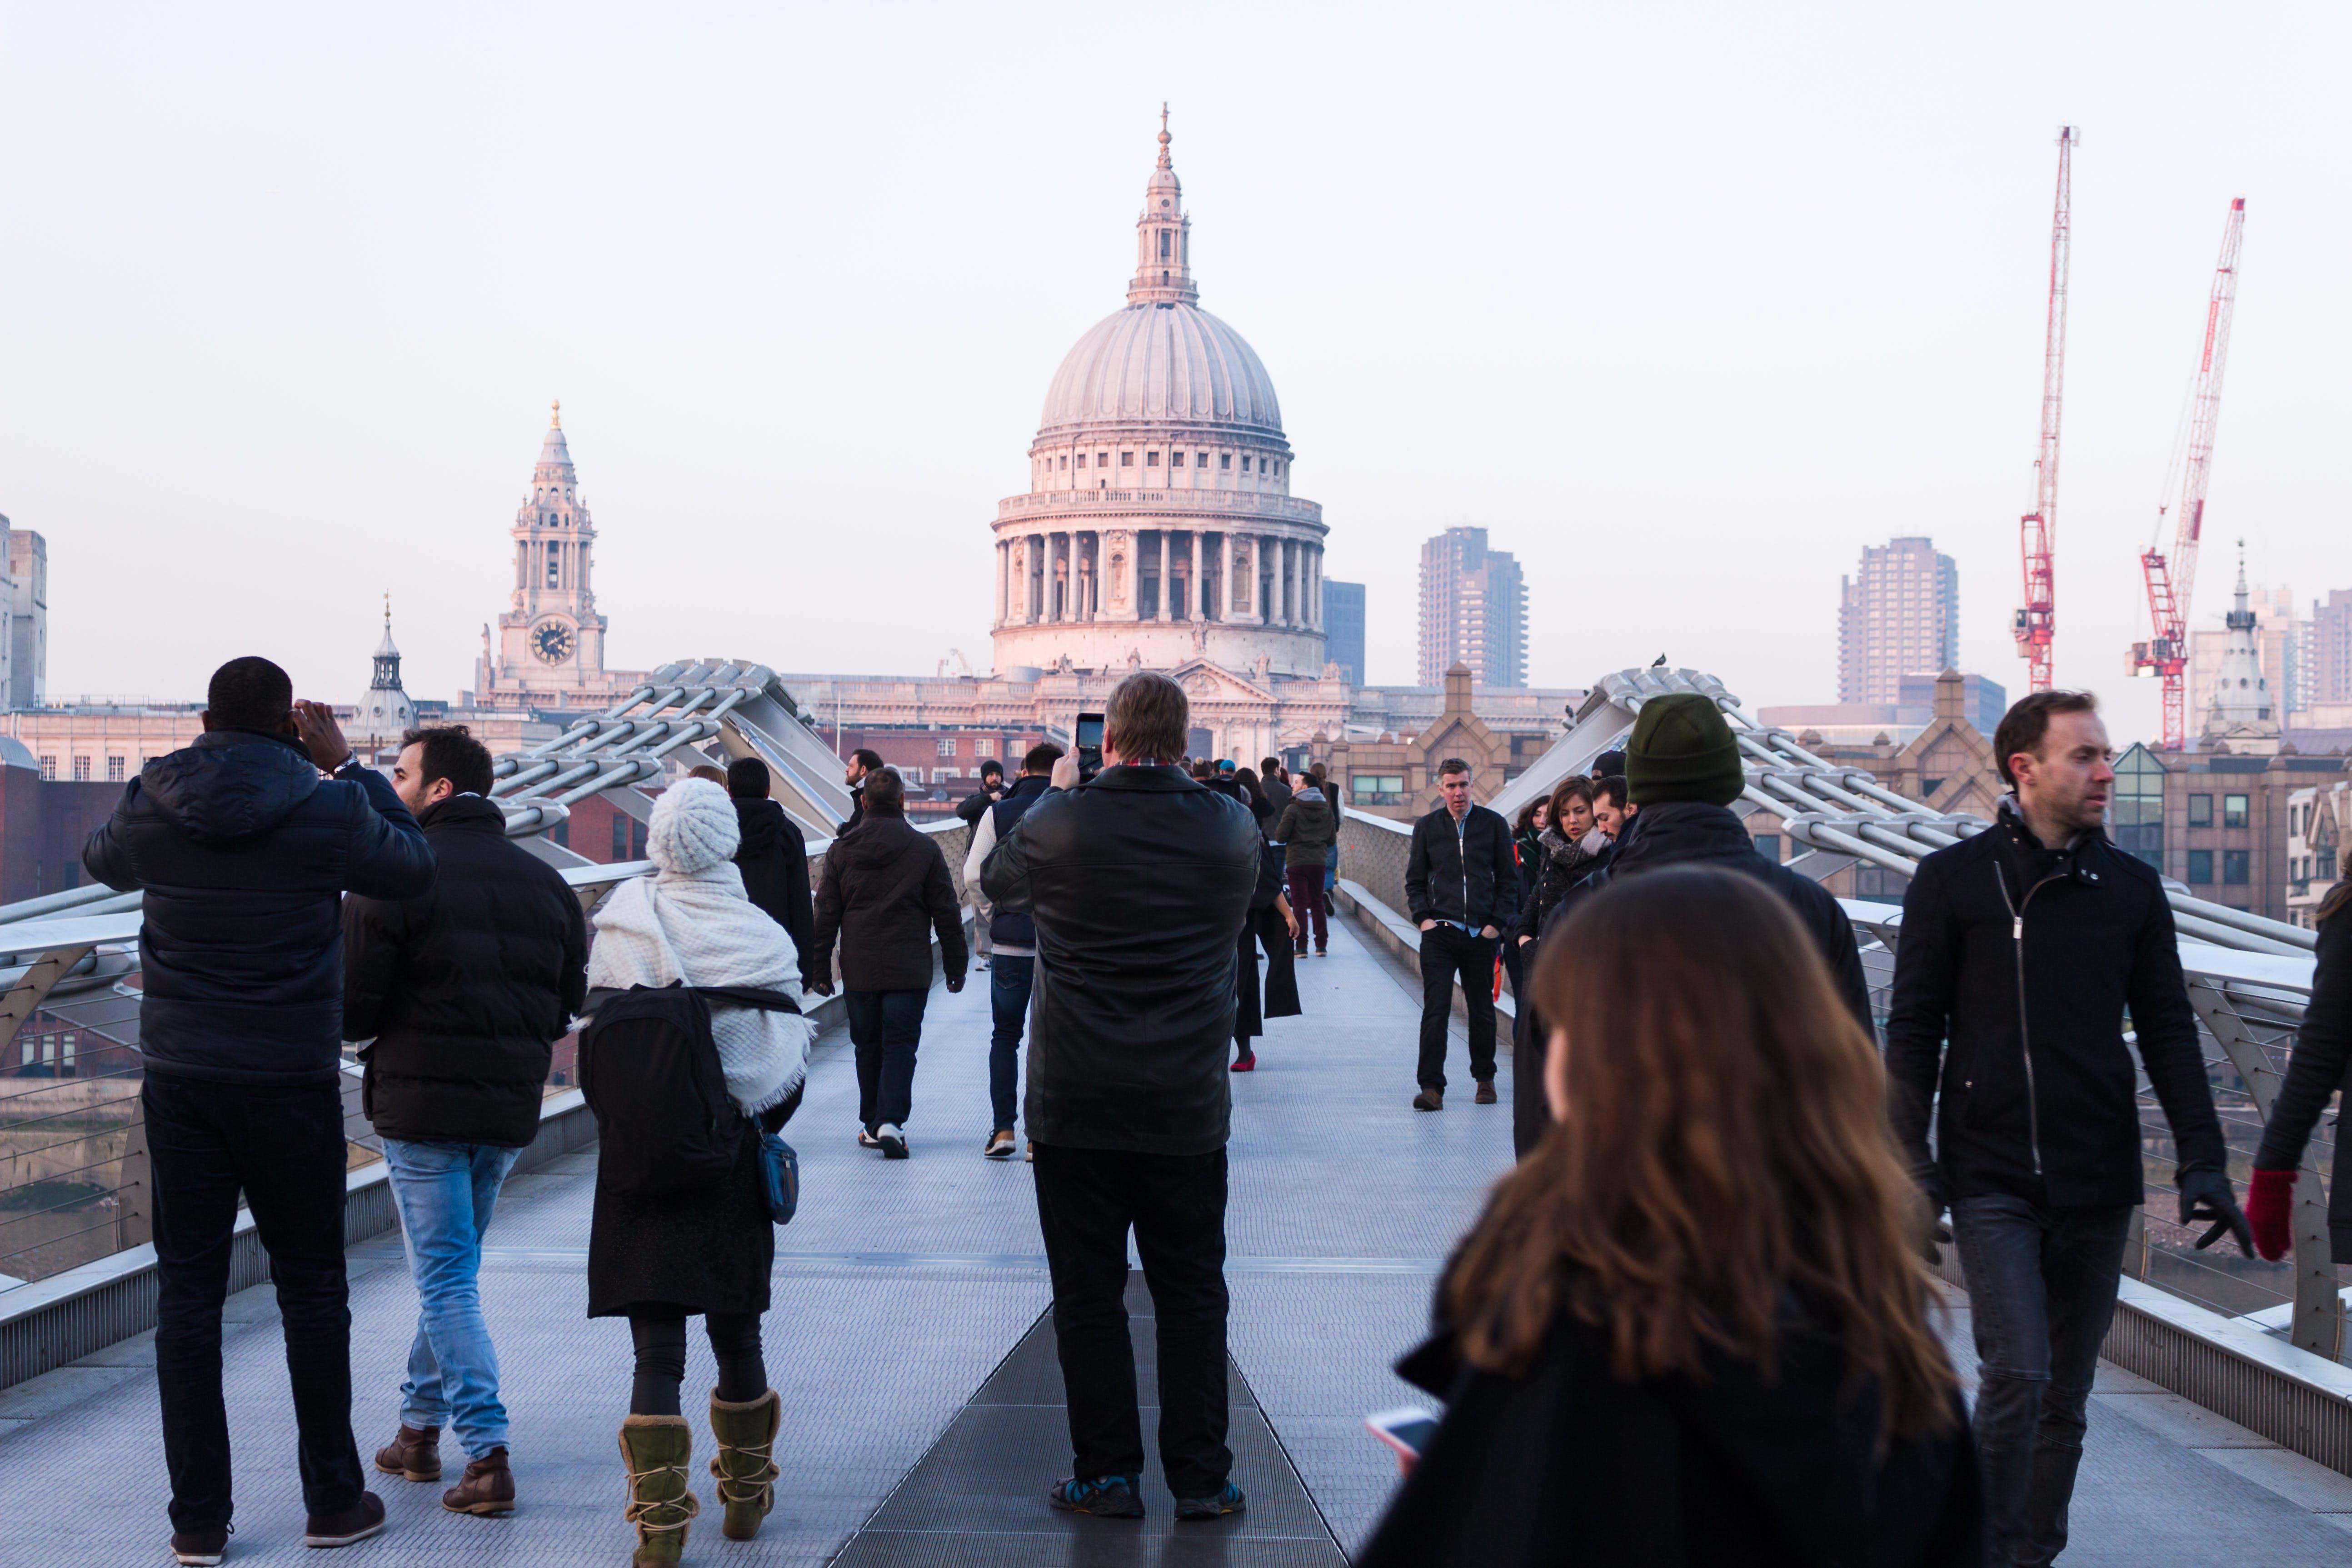 People Walking on Concrete Walkway Near Dome